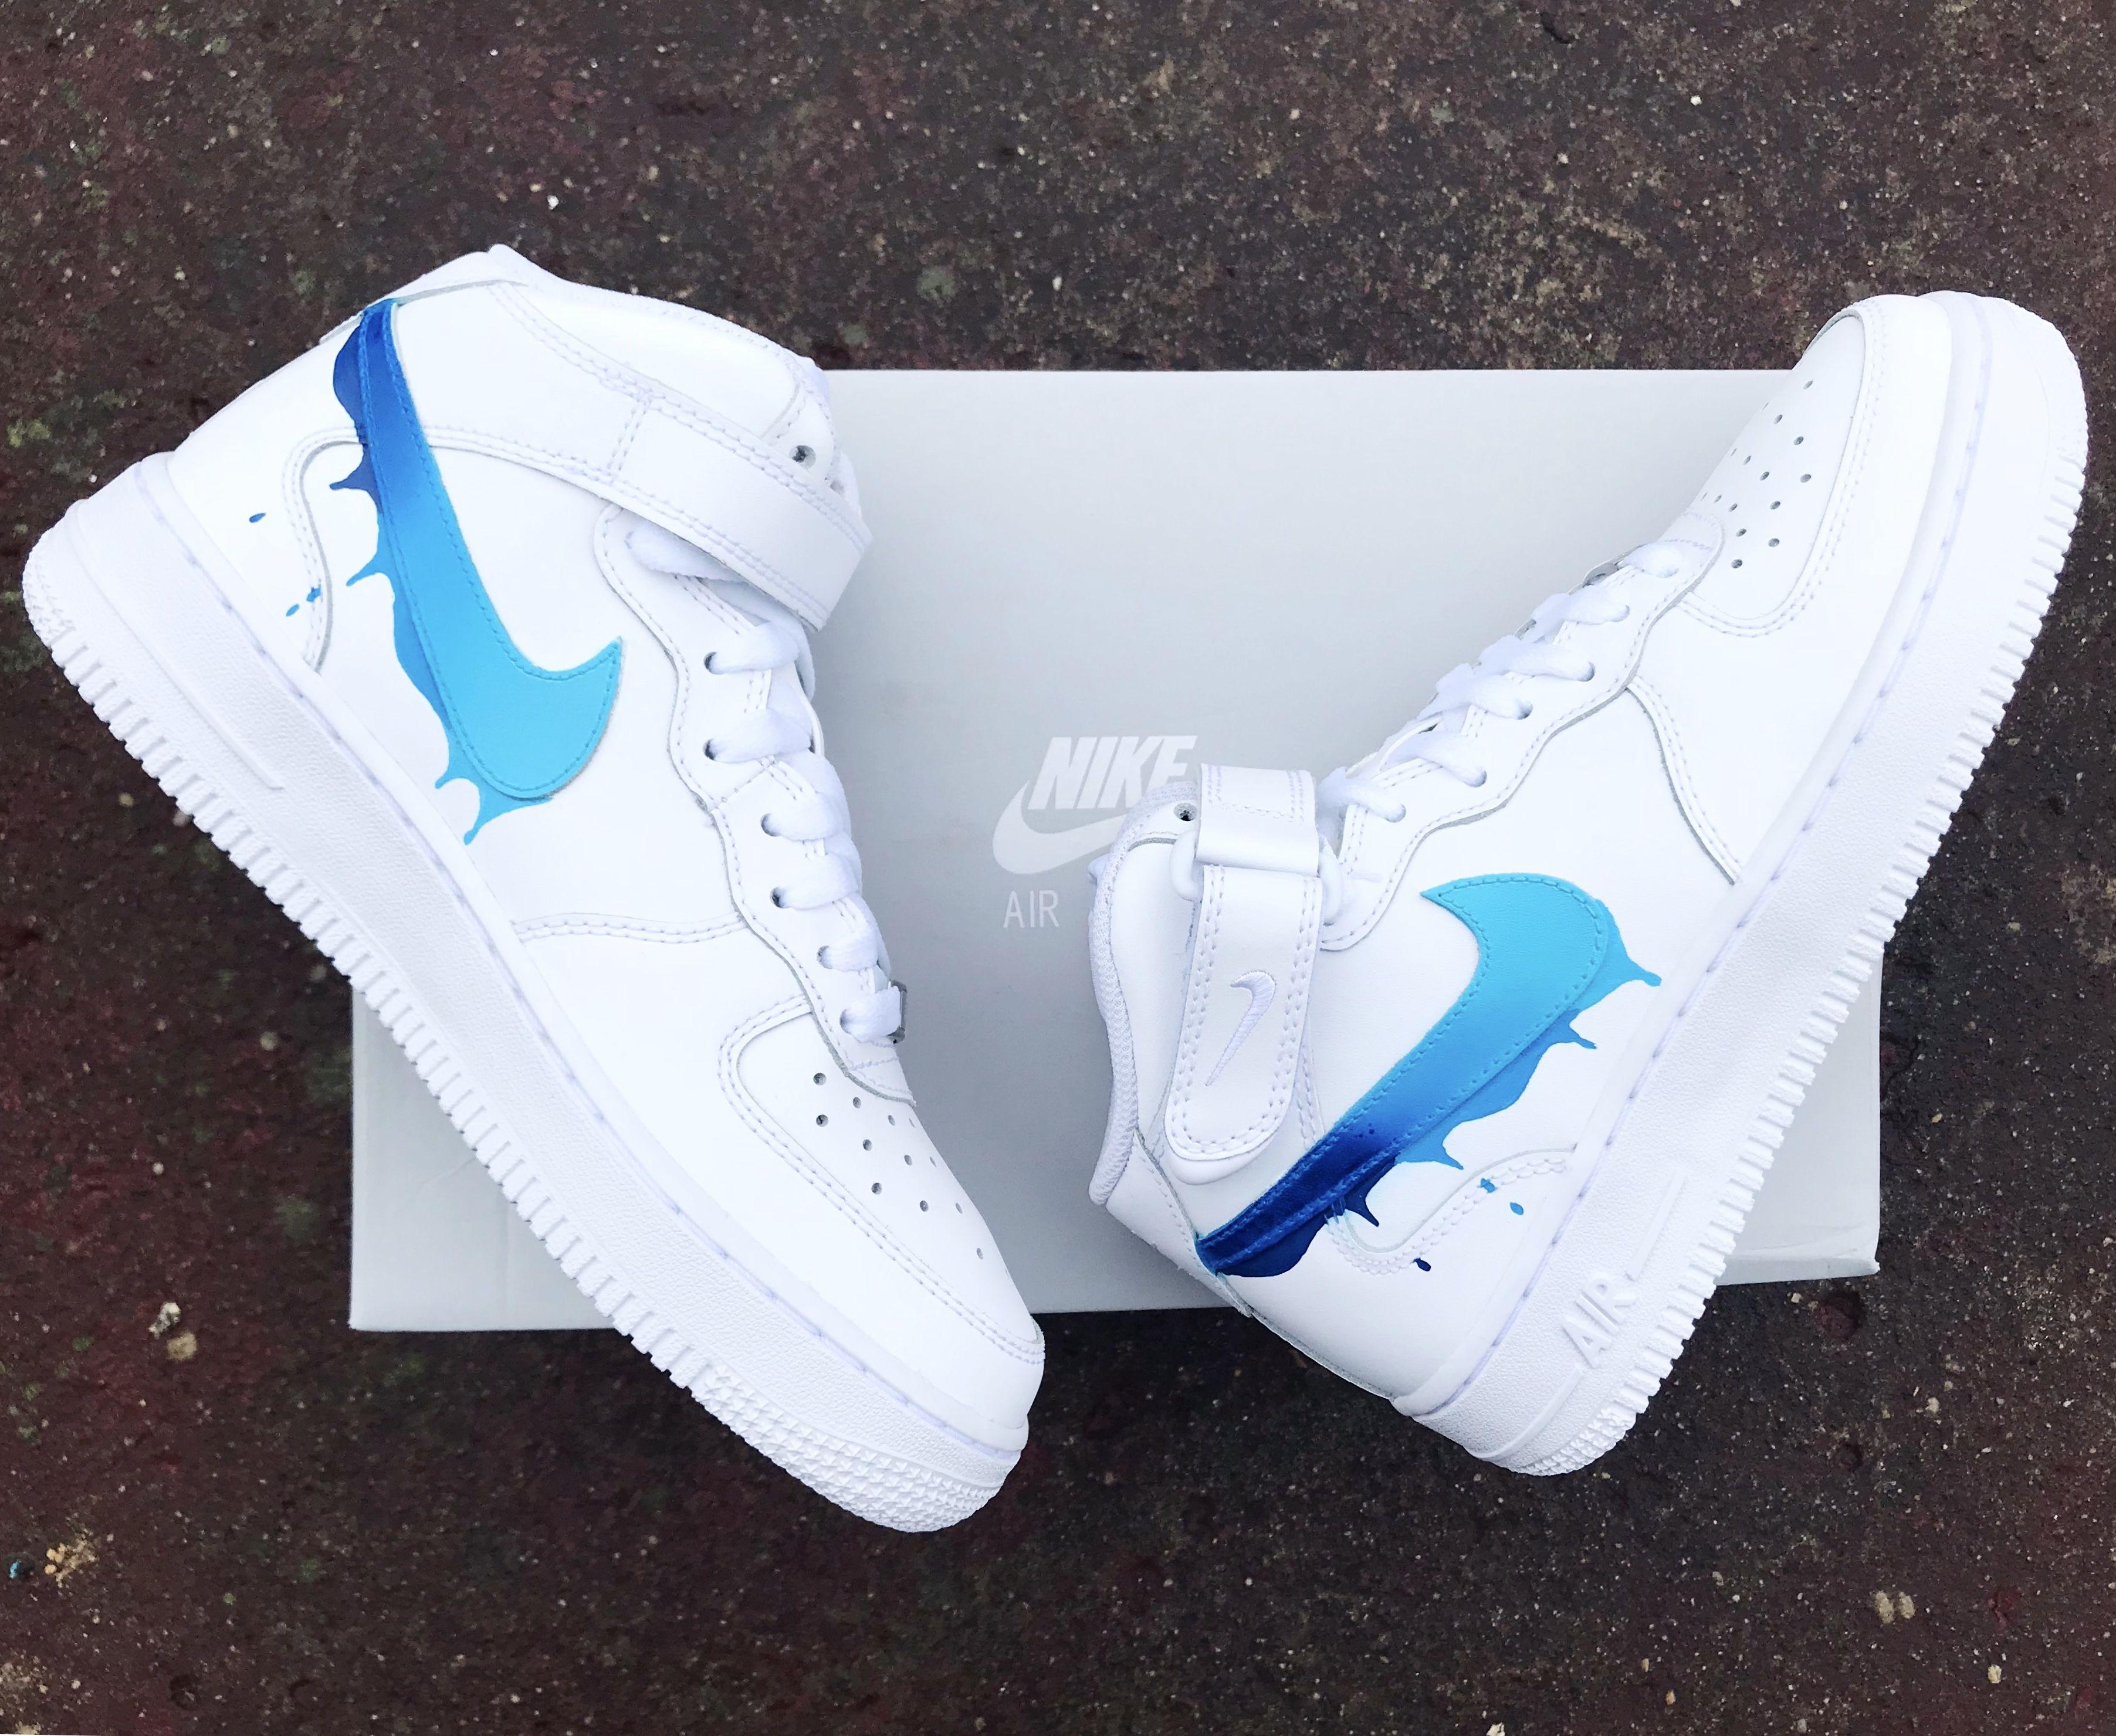 Nike Air Force Drippy | Sneakers fashion, Custom nike shoes